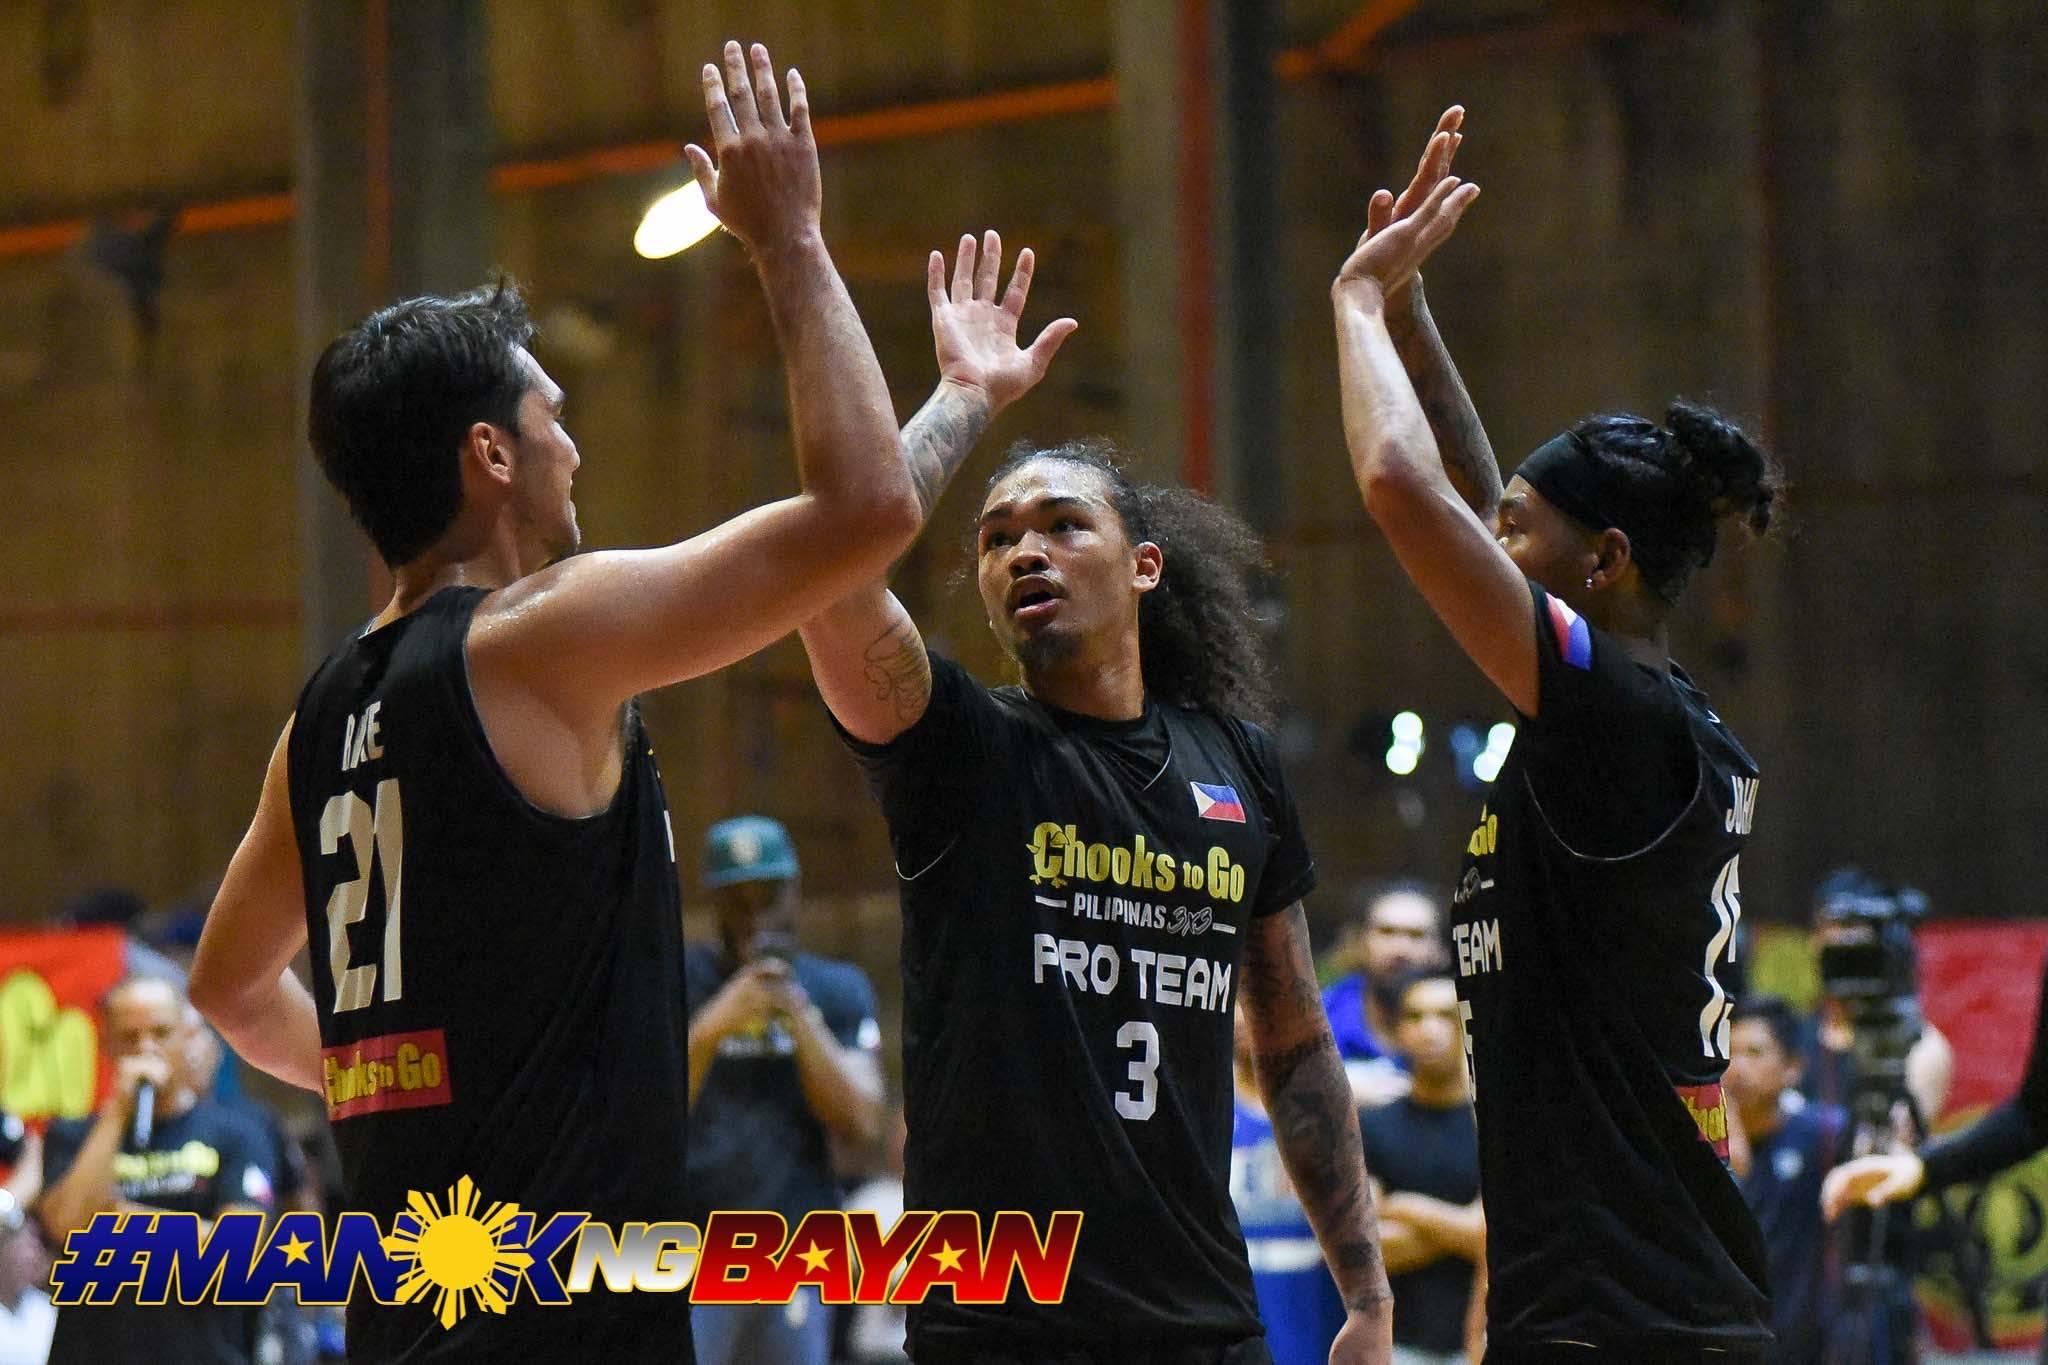 Tiebreaker Times Chooks 3x3 stars to be honored during PSA Awards 3x3 Basketball Chooks-to-Go Pilipinas 3x3 News  Ronald Mascarinas Joshua Munzon Alvin Pasaol 2020 PSA Awards